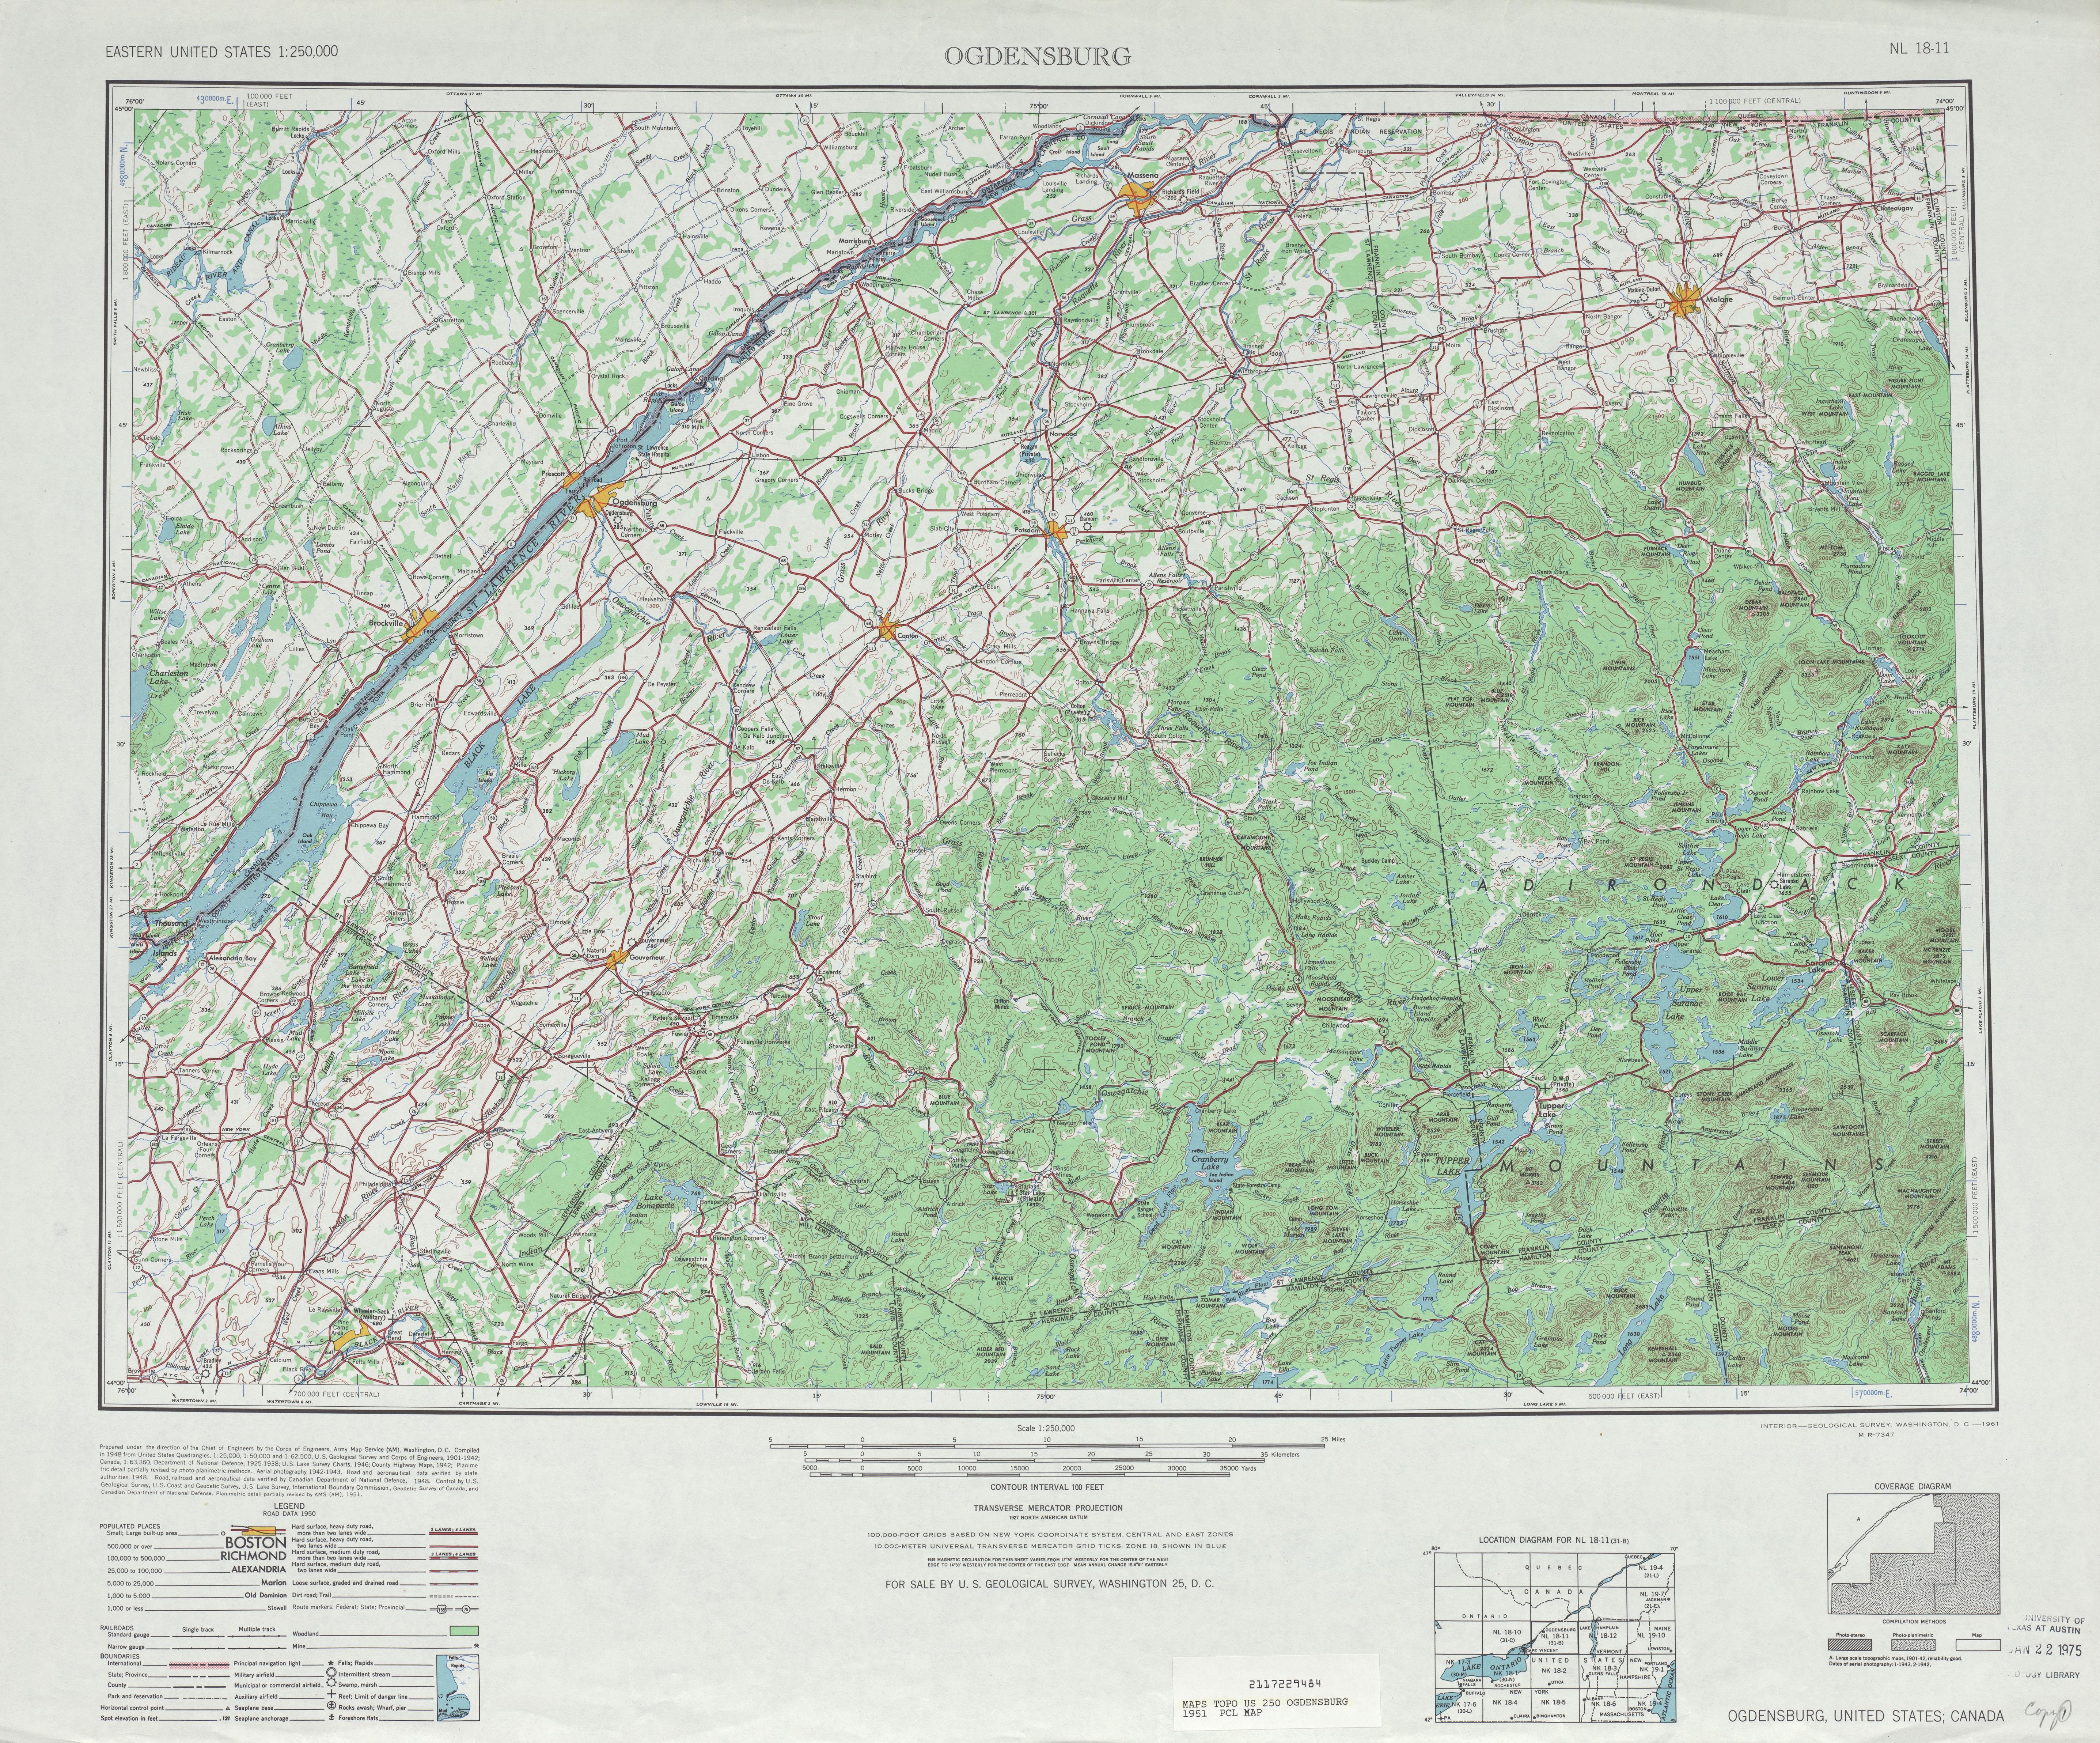 Ogdensburg Topographic Map Sheet, United States 1951